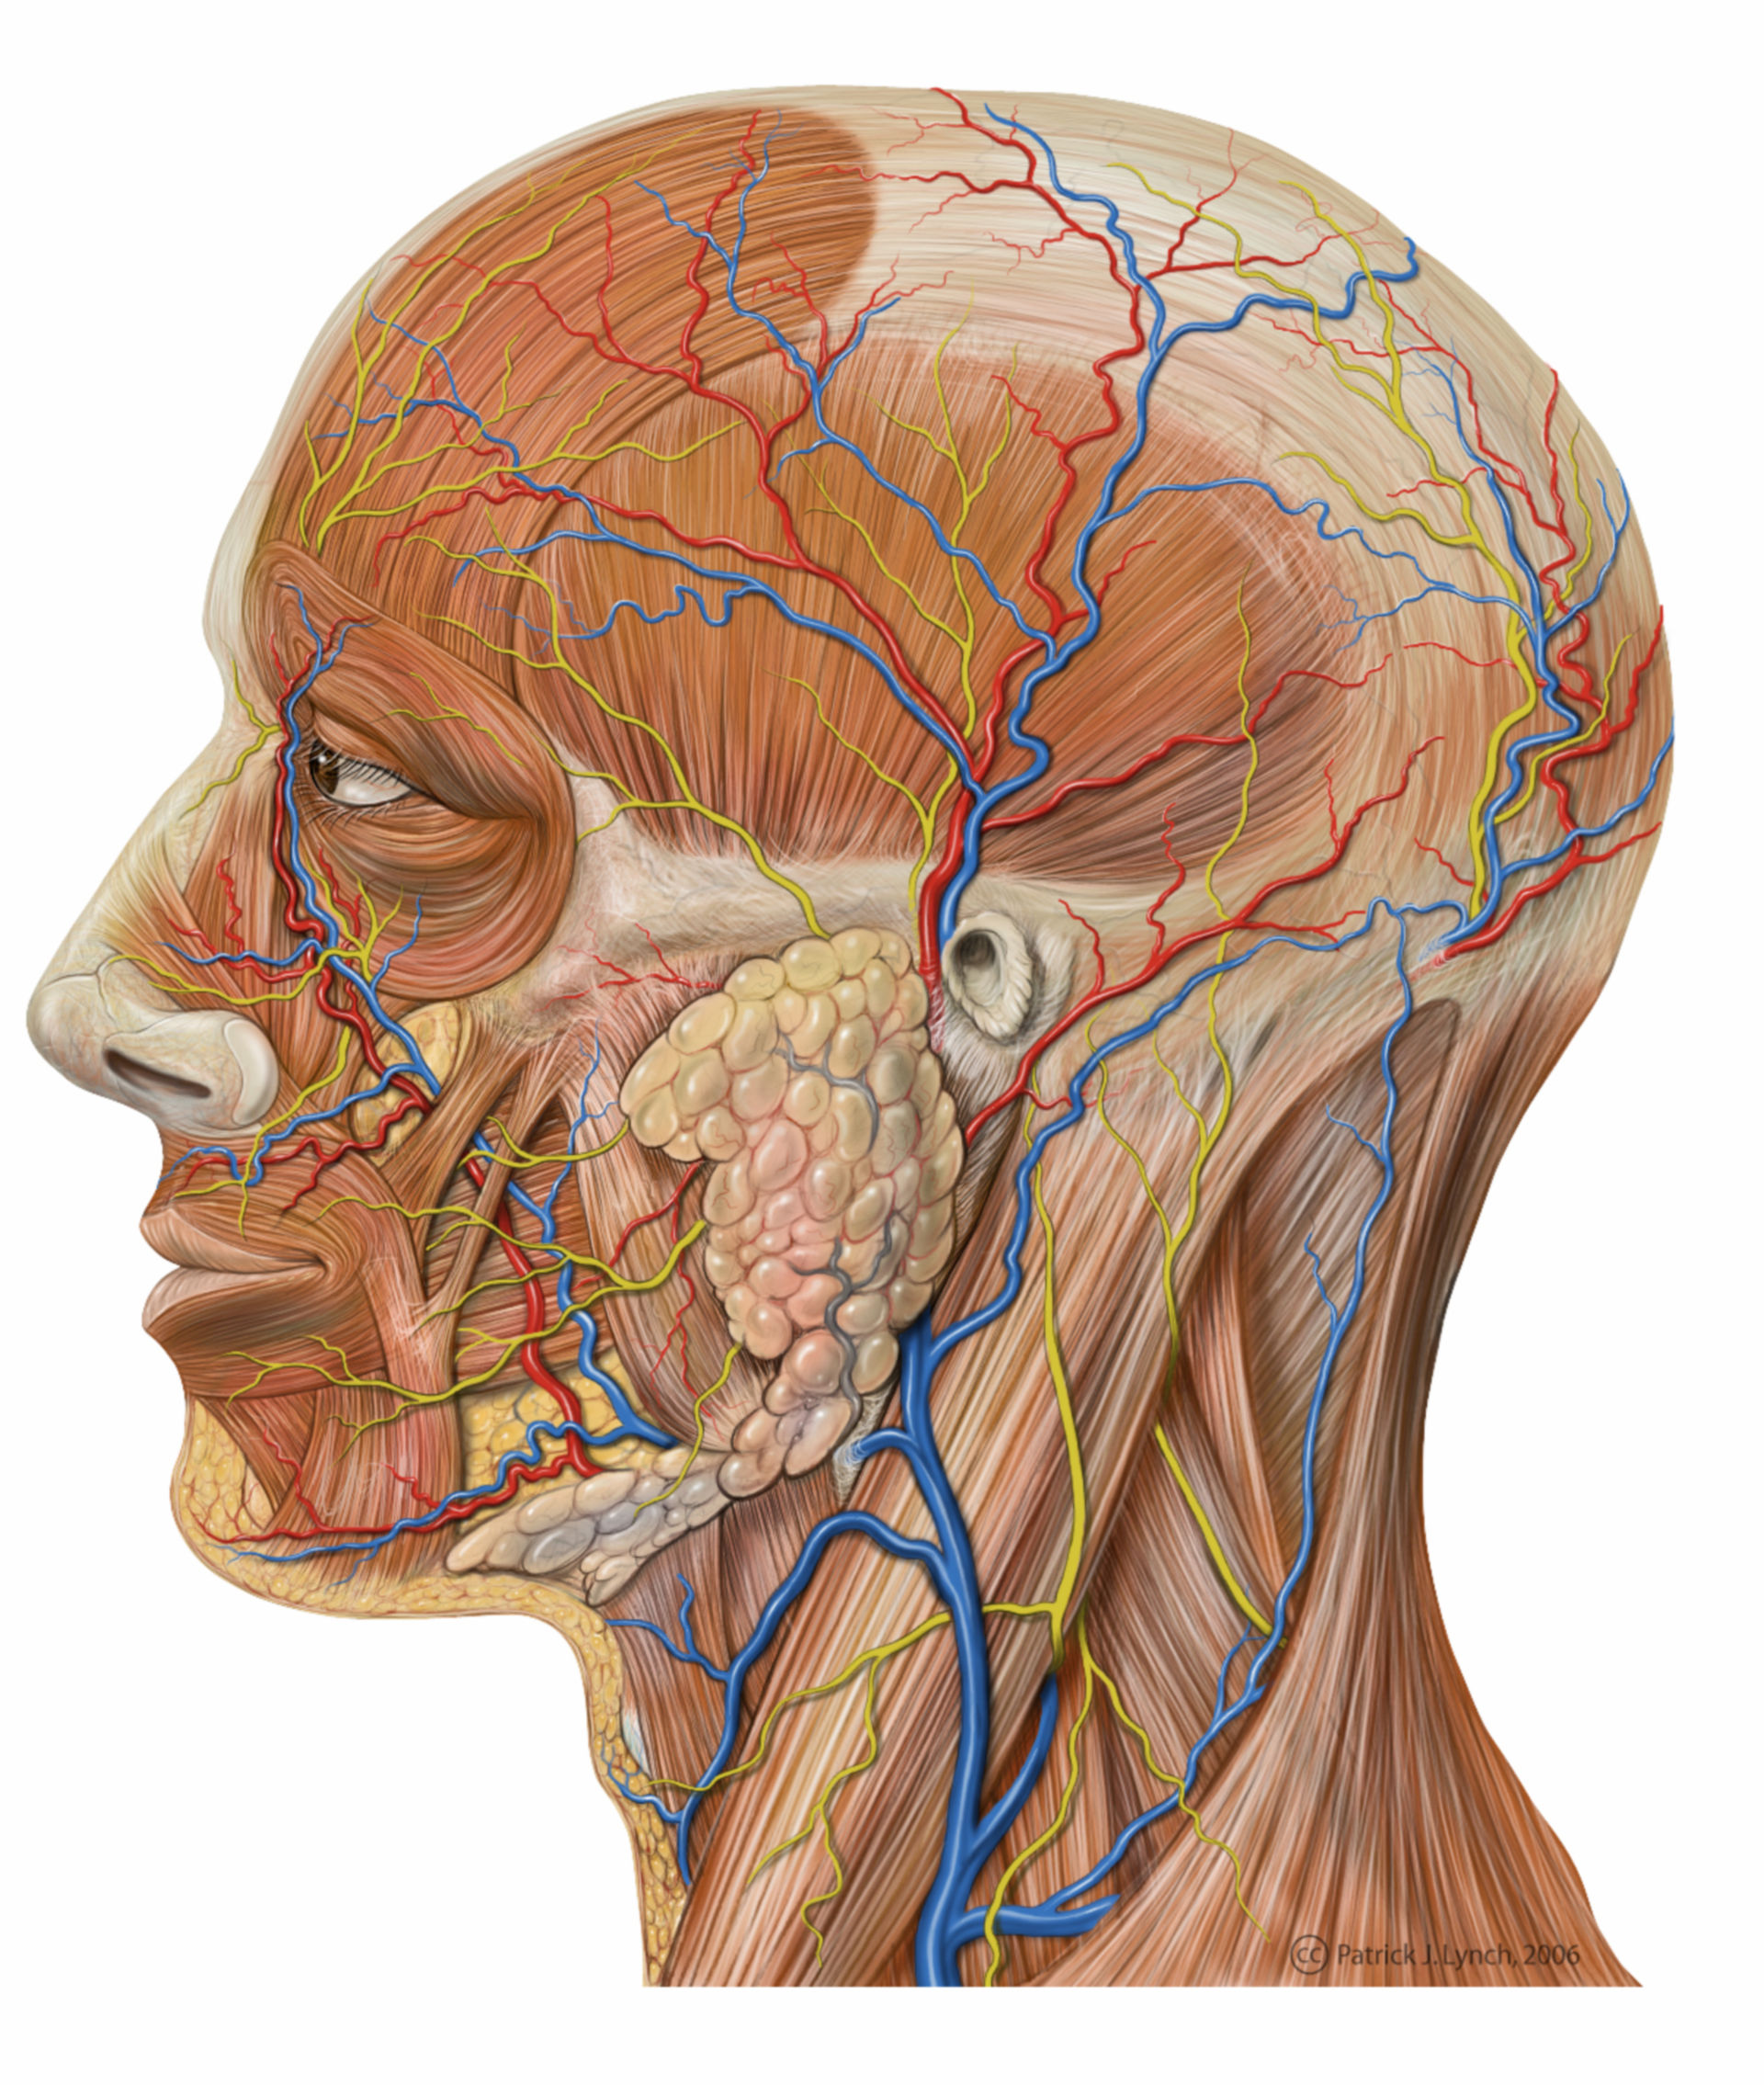 Anatomie des Kopfes (Illustration, laterale Ansicht)